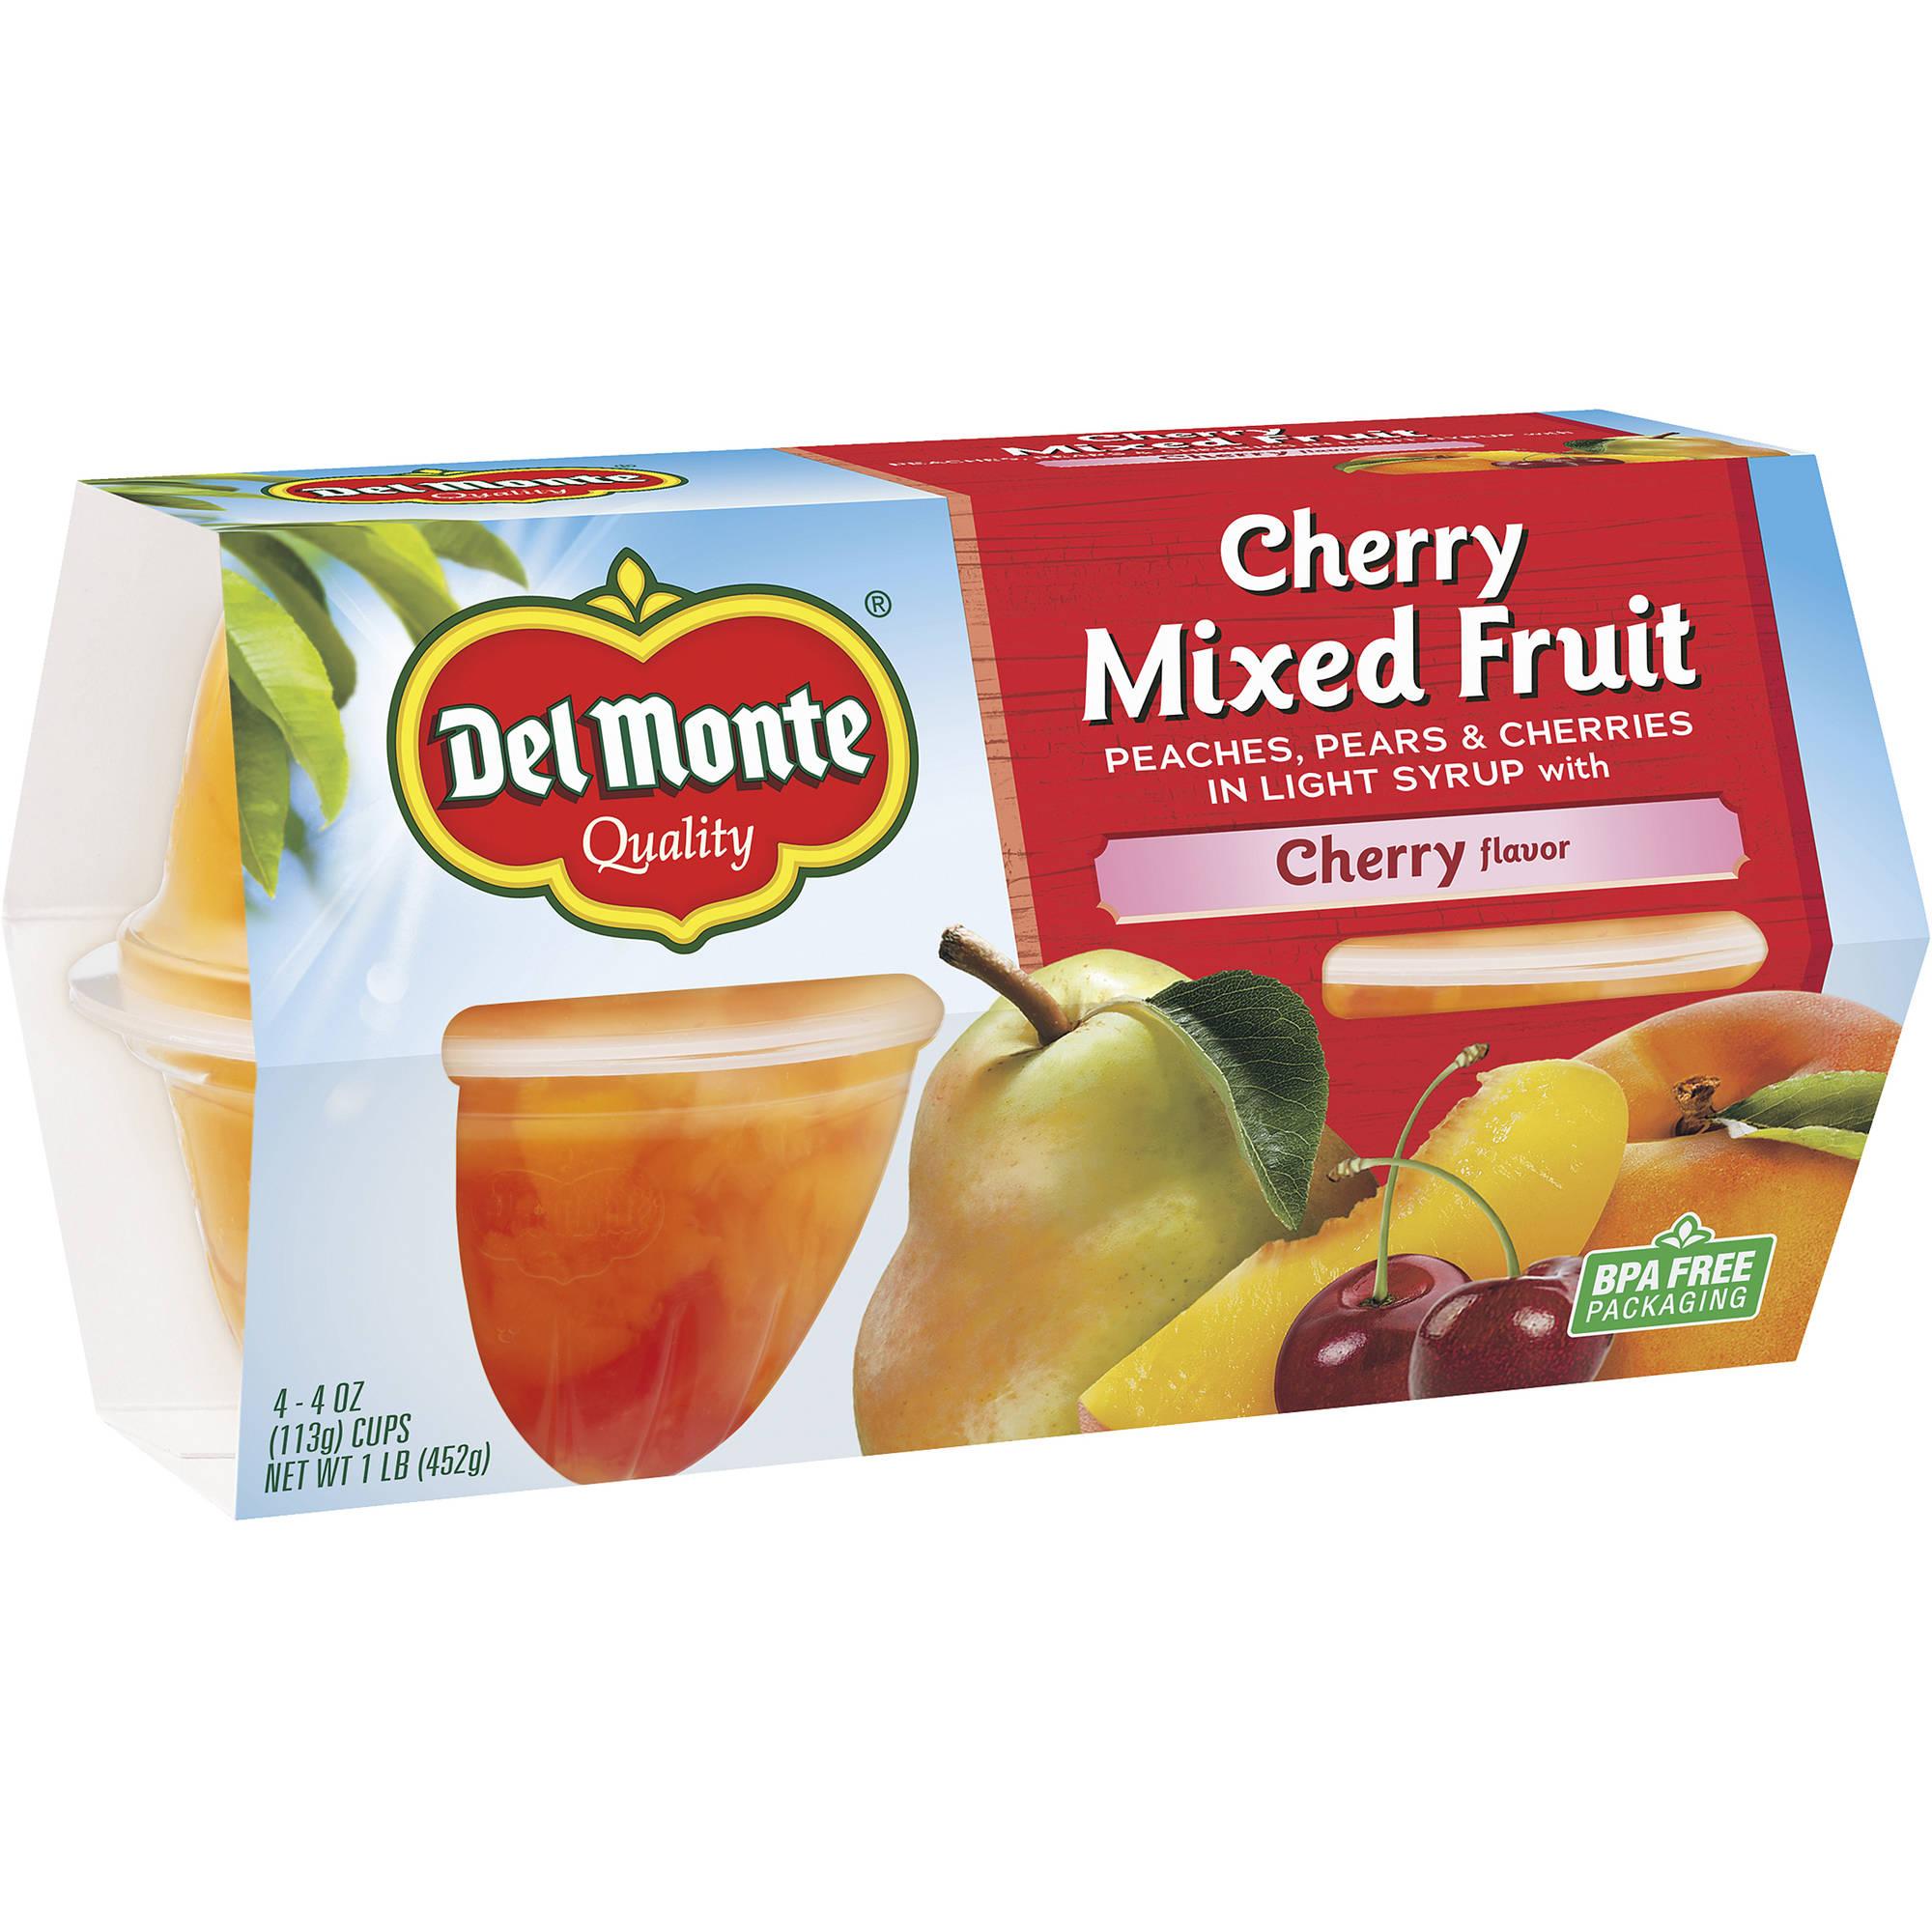 Del Monte Cherry Mixed Fruit, 4 oz, 4 count